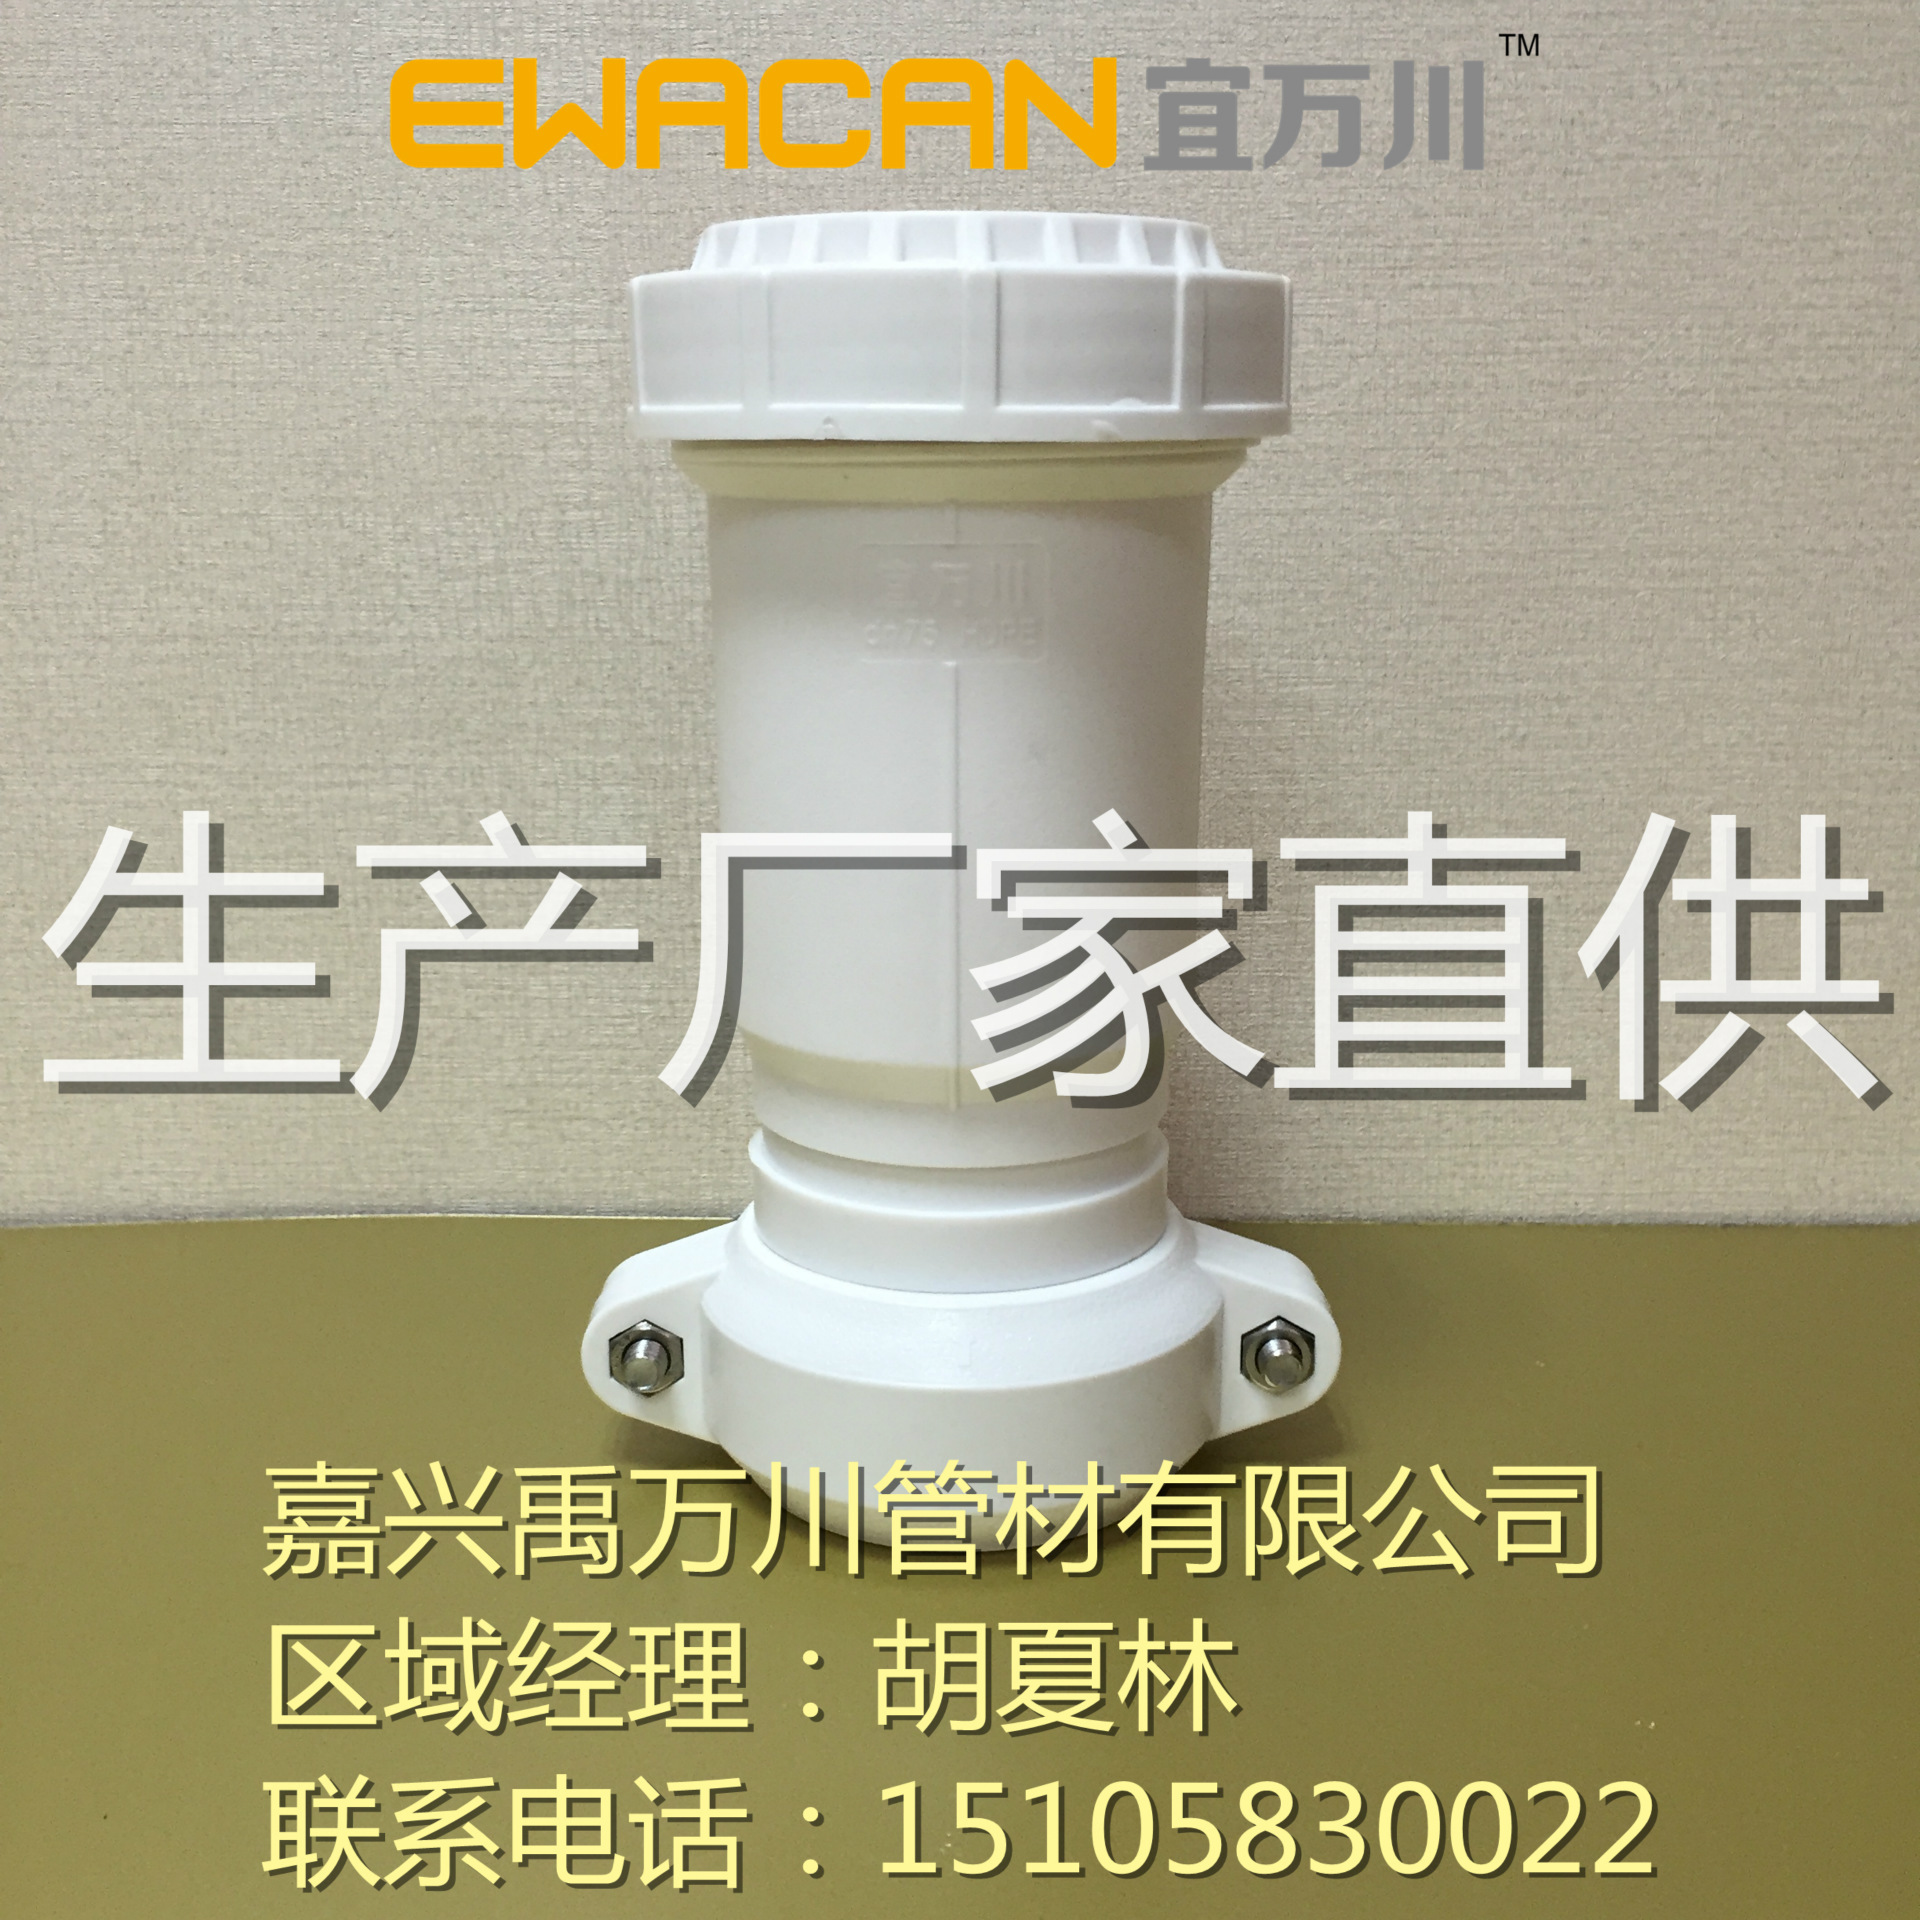 HDPE沟槽式静音排水管,沟槽式中空排水管,PE沟槽管,伸缩节示例图5